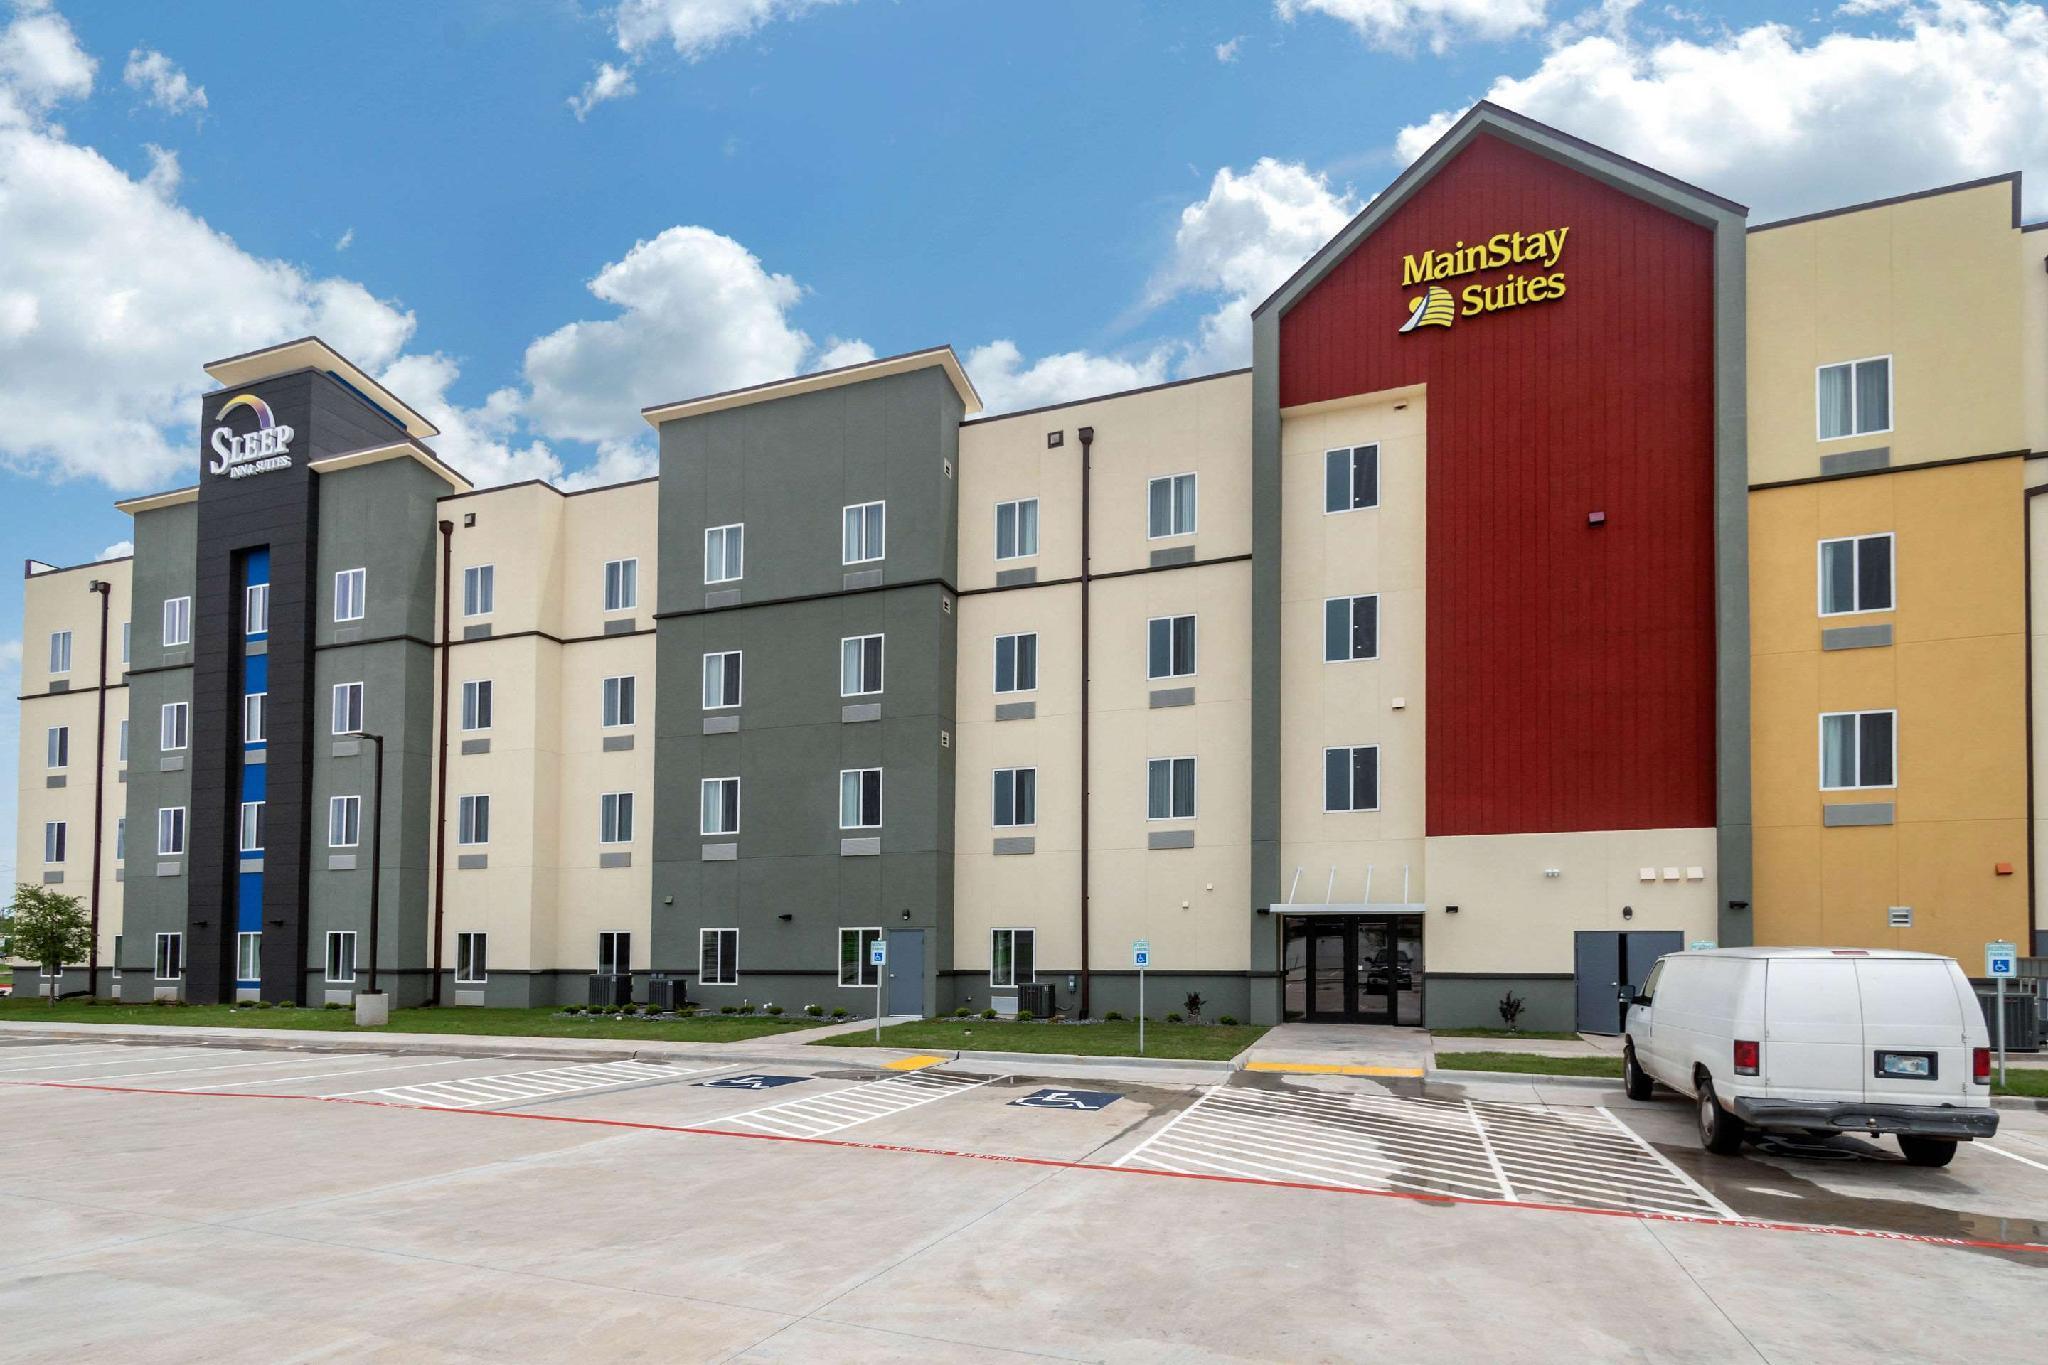 MainStay Suites Bricktown   Near Medical Center